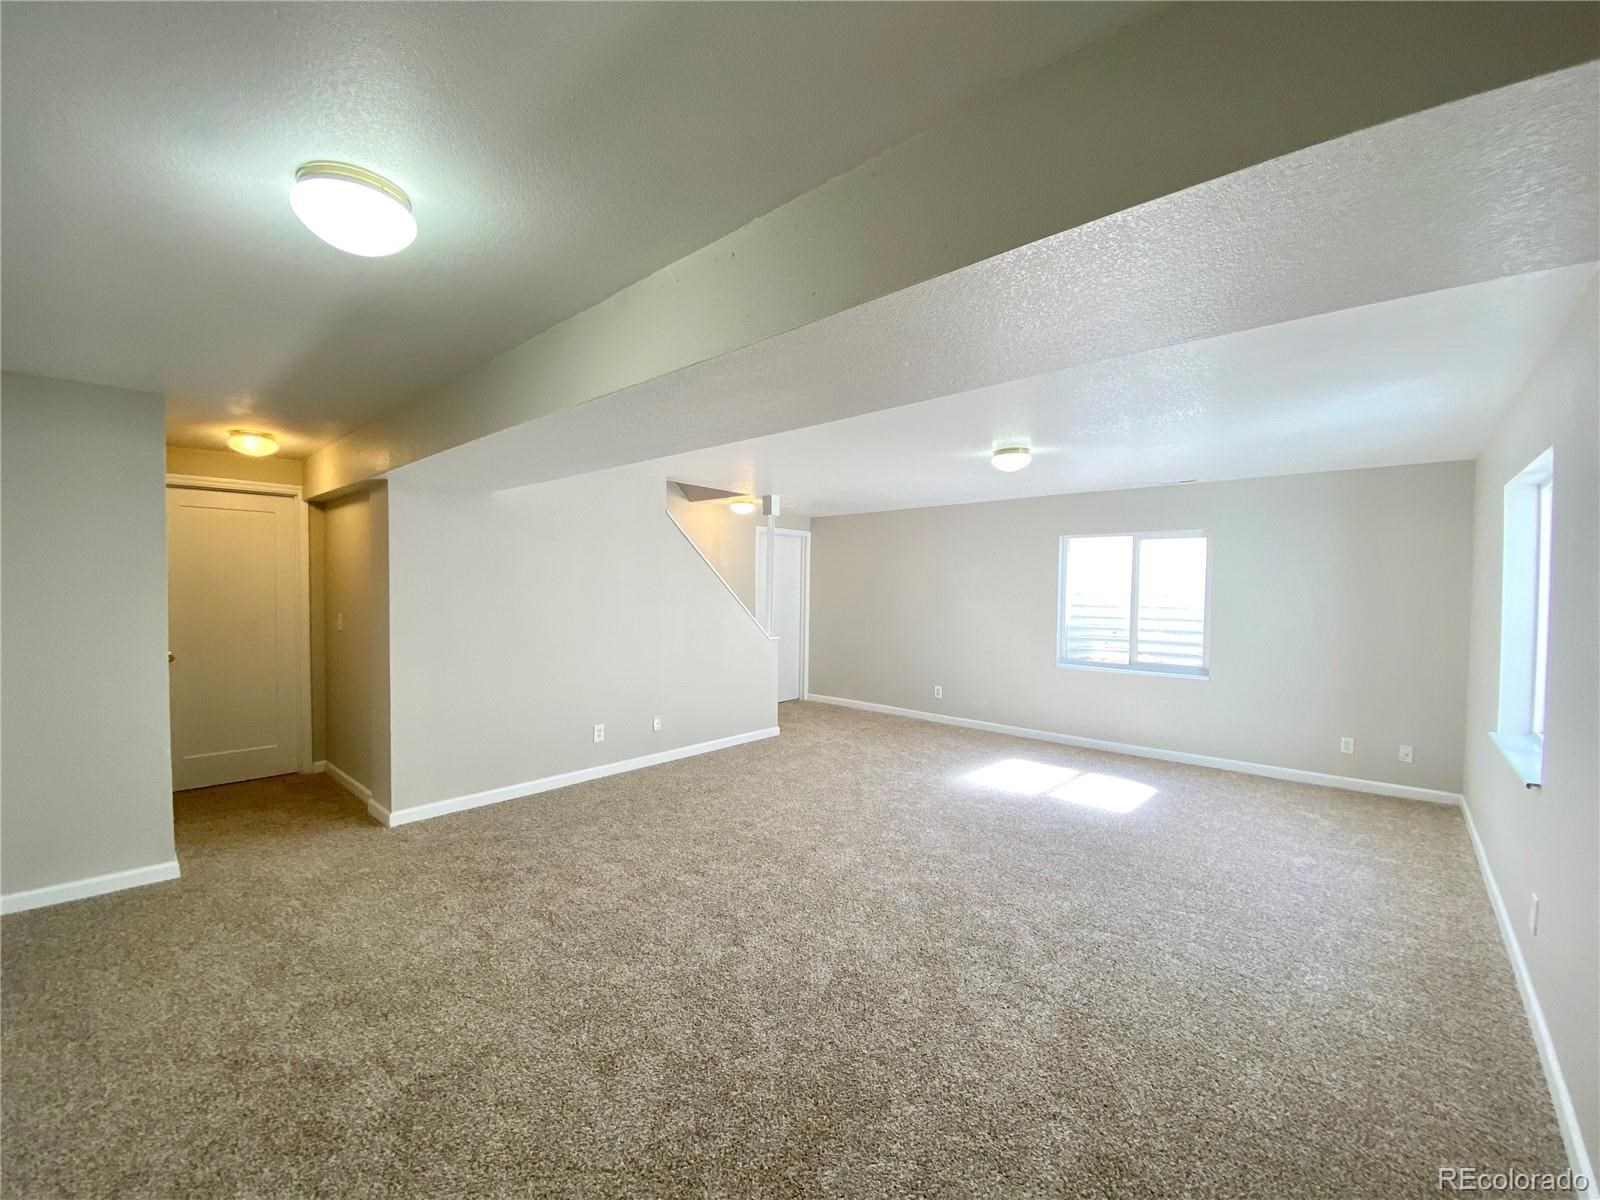 MLS# 6788673 - 15 - 5311 Suburban , Colorado Springs, CO 80911